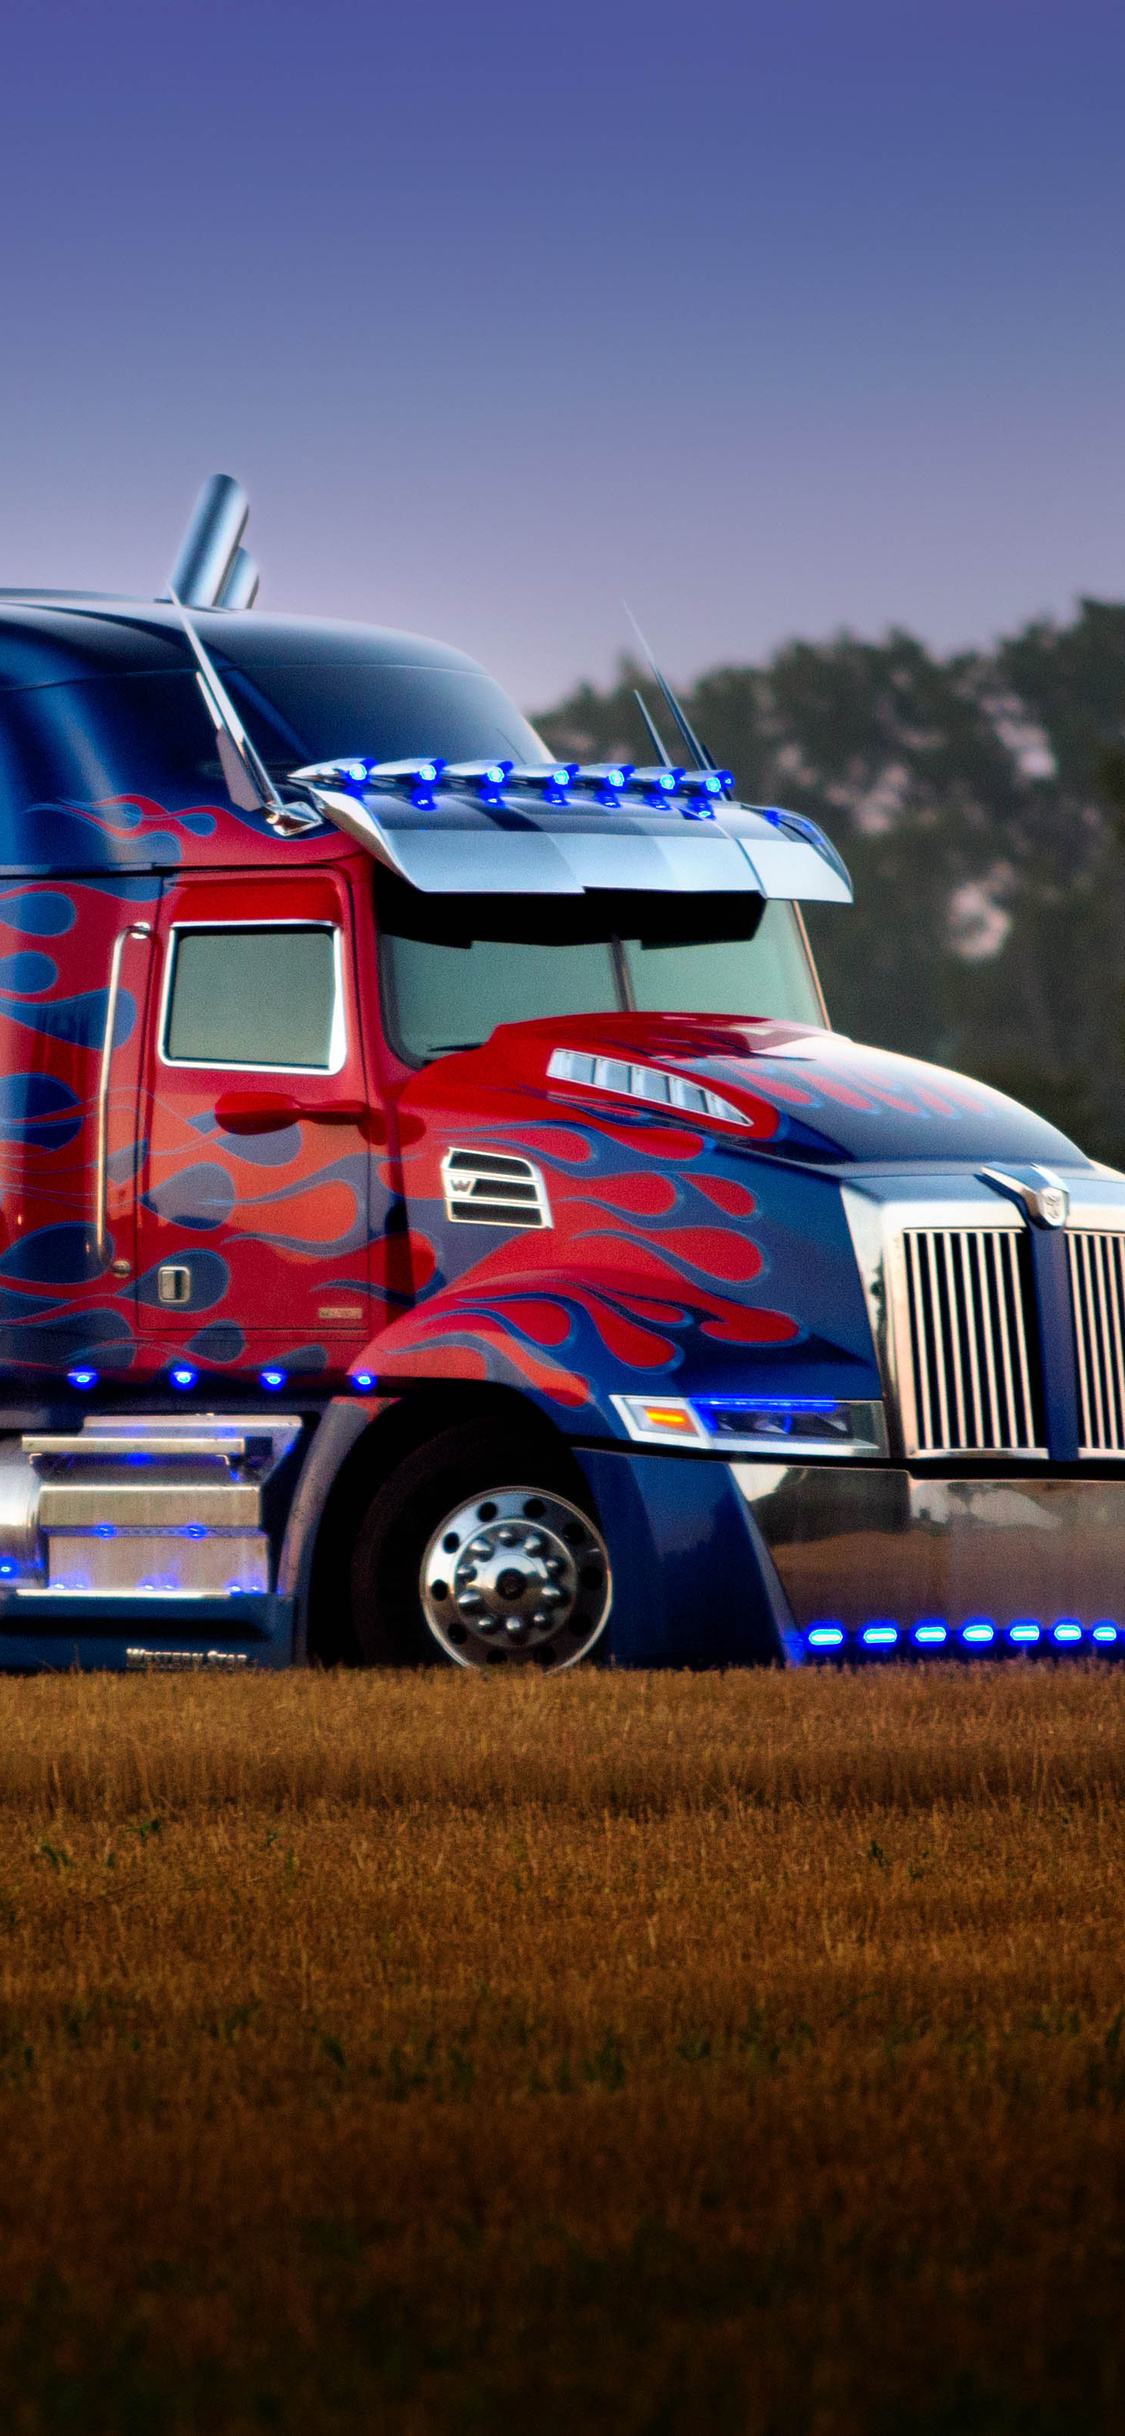 transformers-the-last-knight-5-optimus-prime-truck-5k-0g.jpg